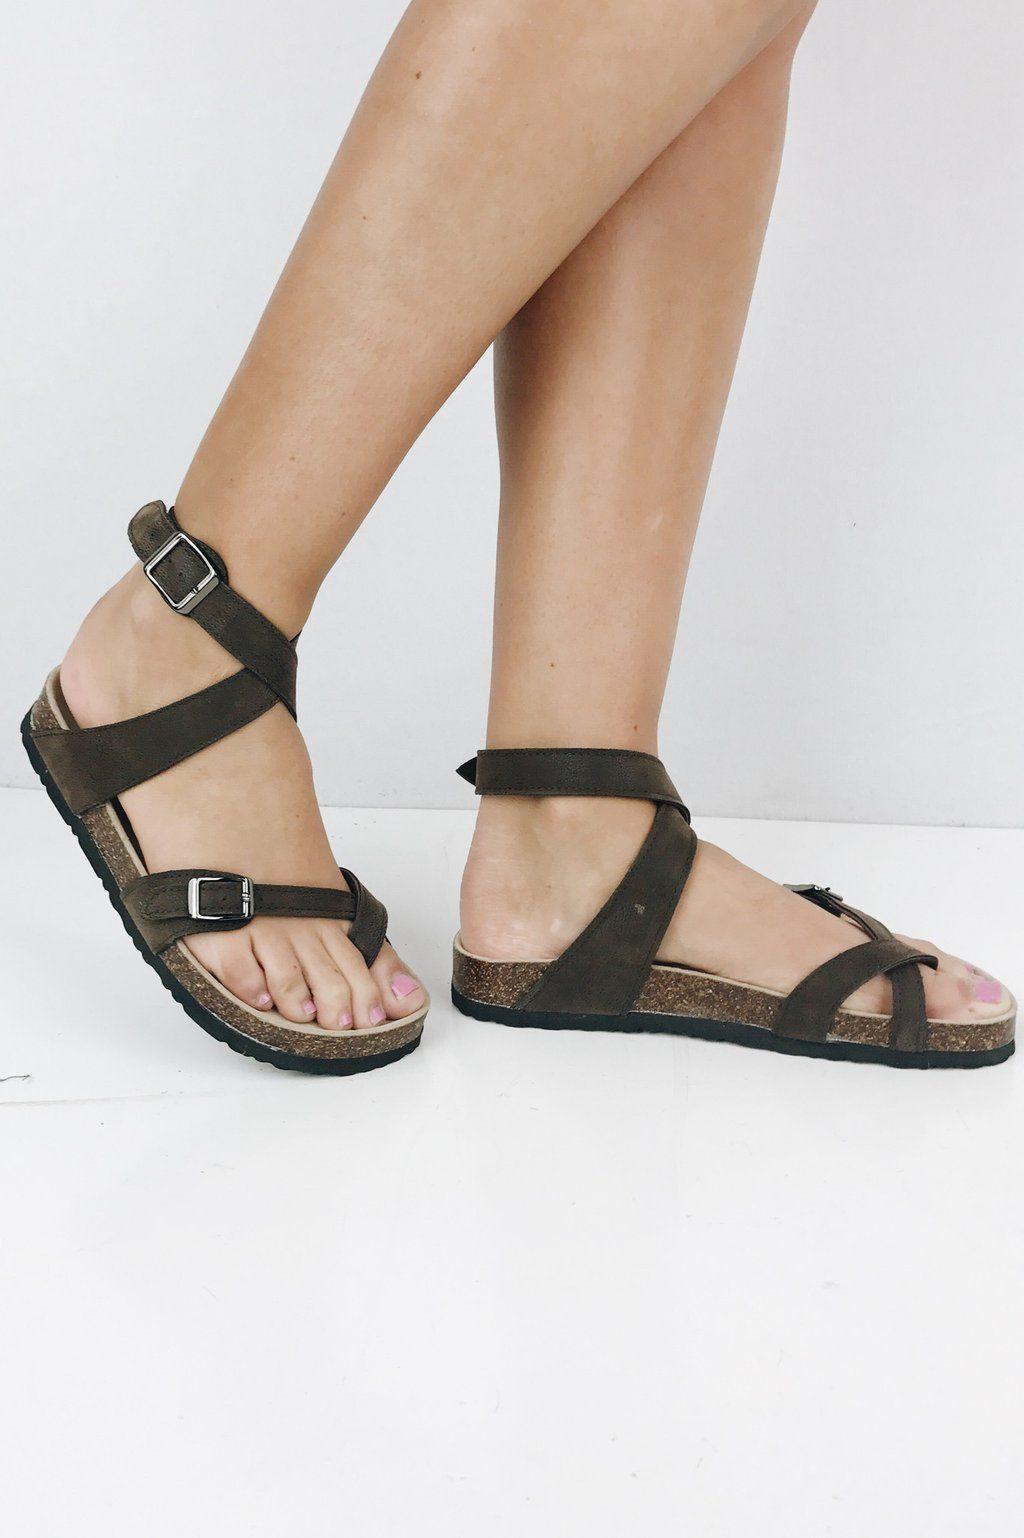 178177c0ce56 Sara Beth Sandal- Brown Ankle Strap